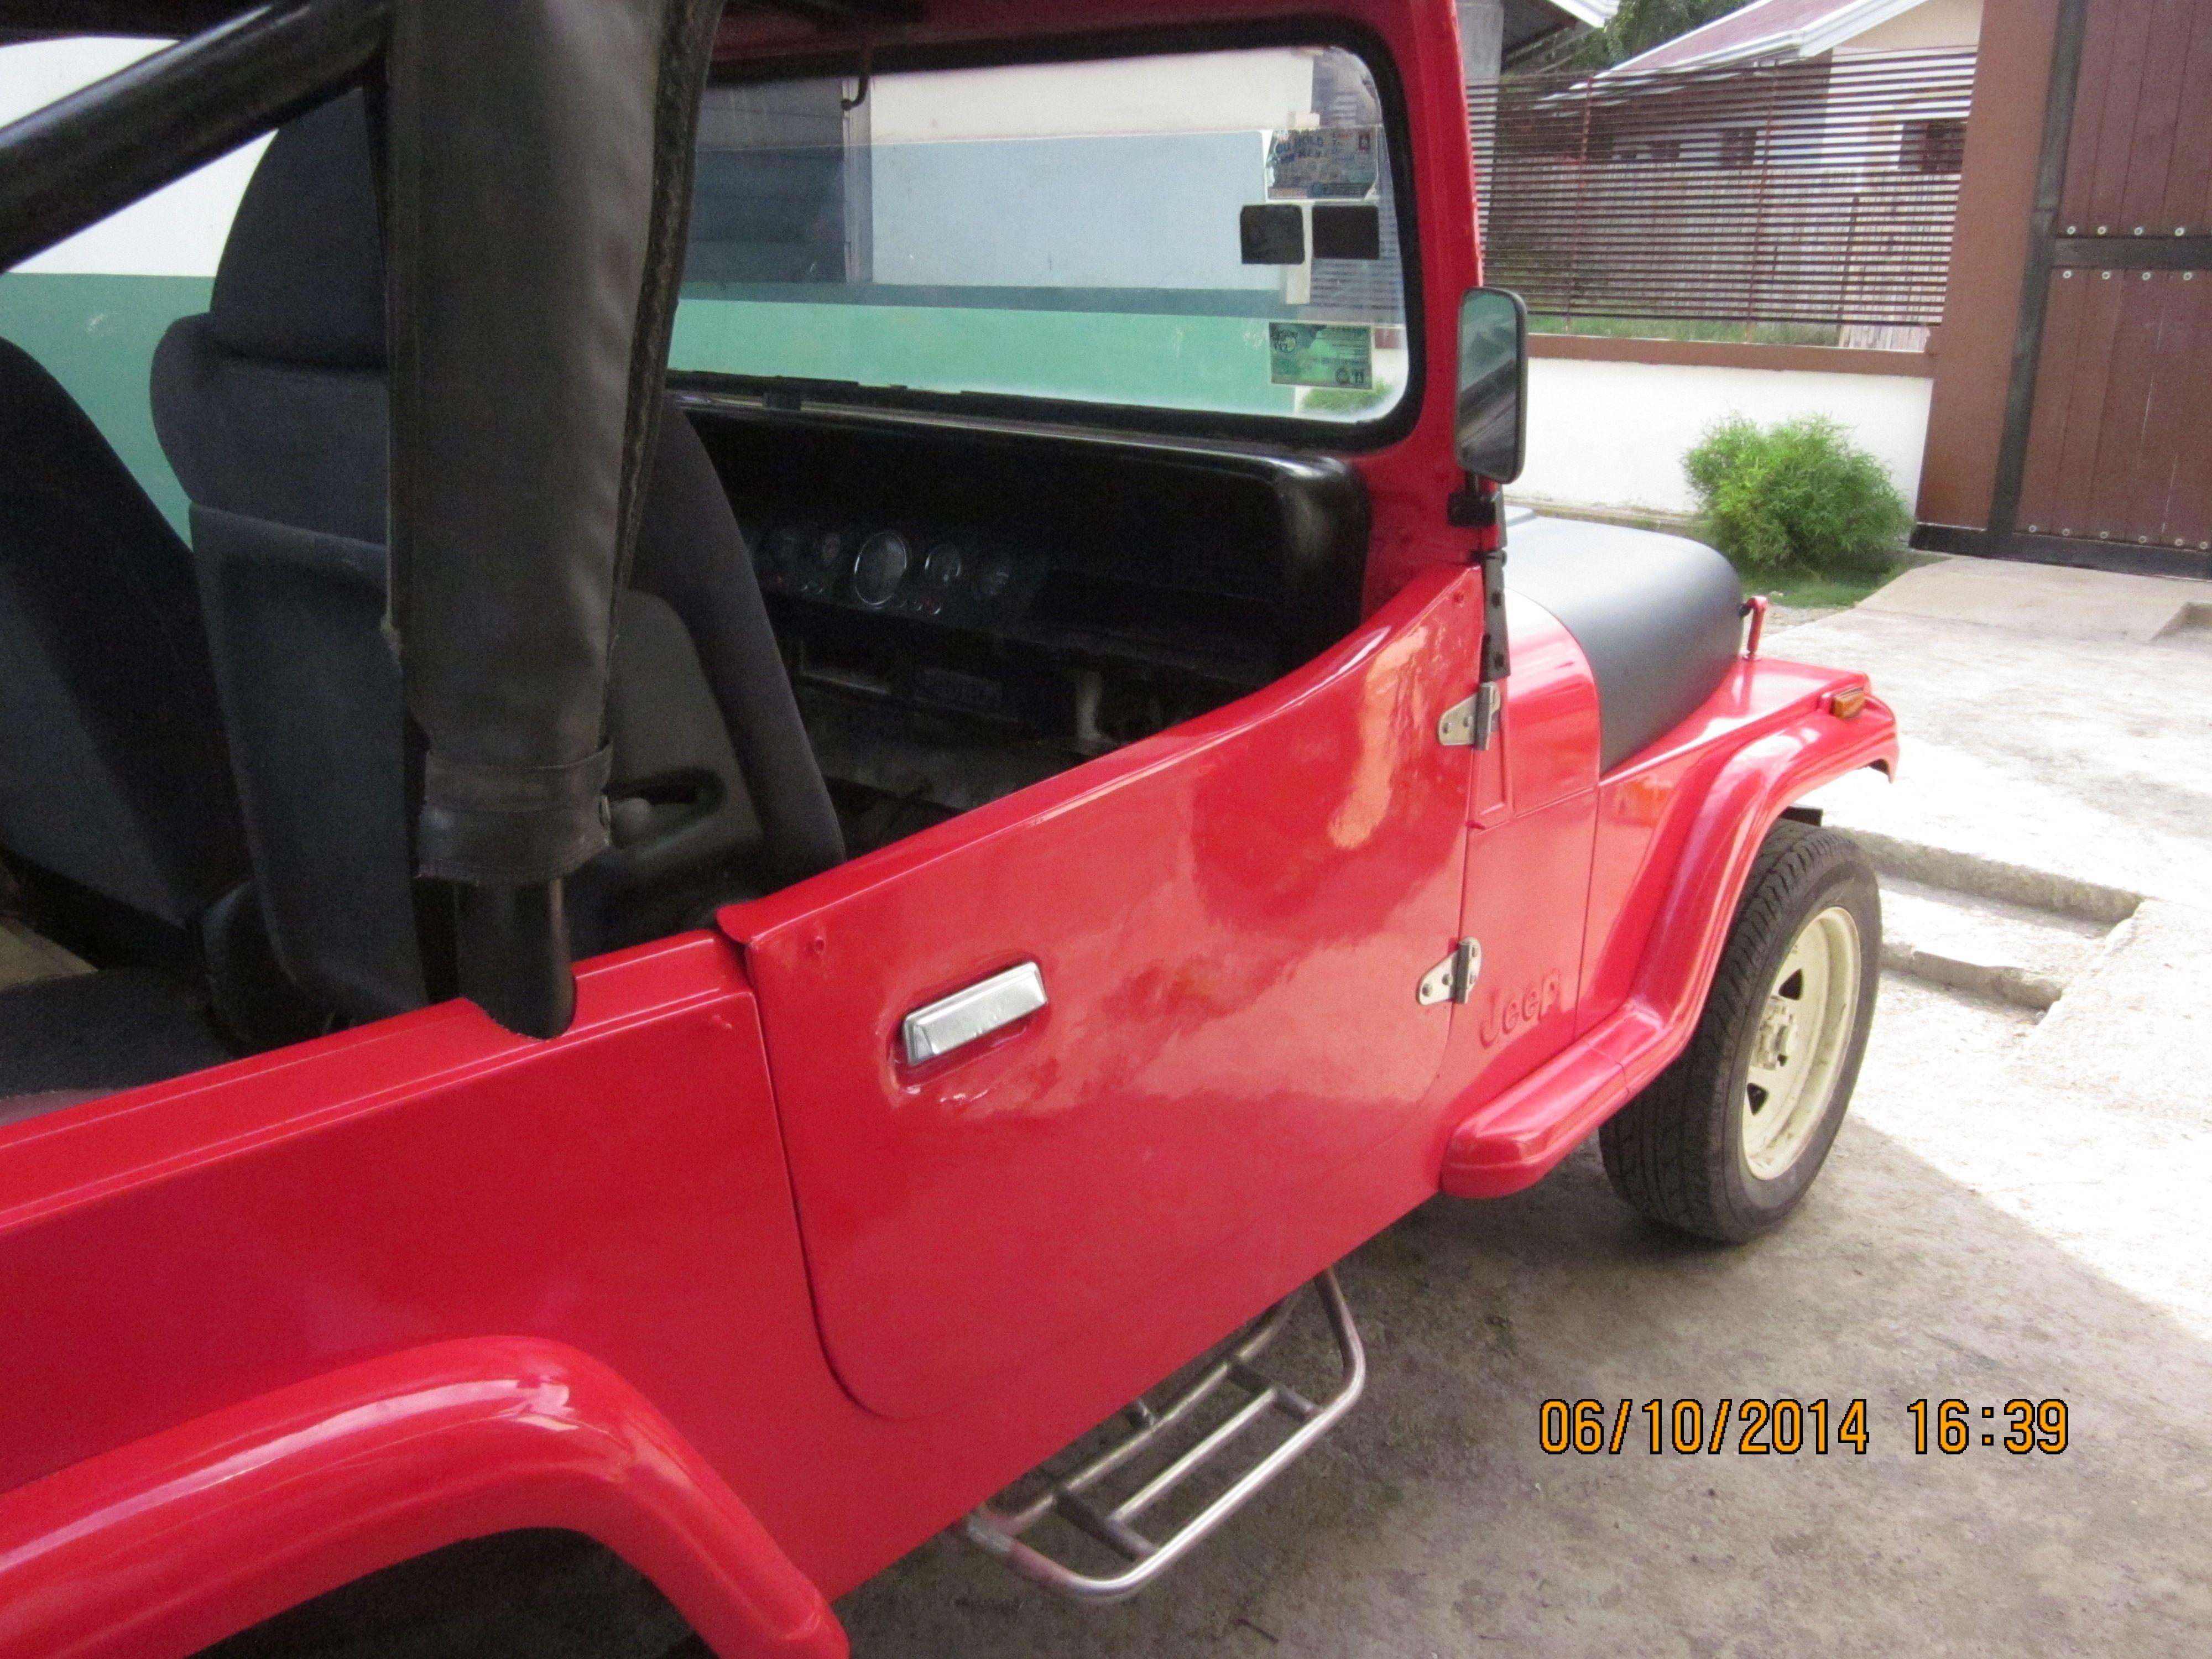 Jeep Wrangler RJ-94 Full Body Restorations and Repainting. The beautiful door. & Jeep Wrangler RJ-94 Full Body Restorations and Repainting. The ... pezcame.com